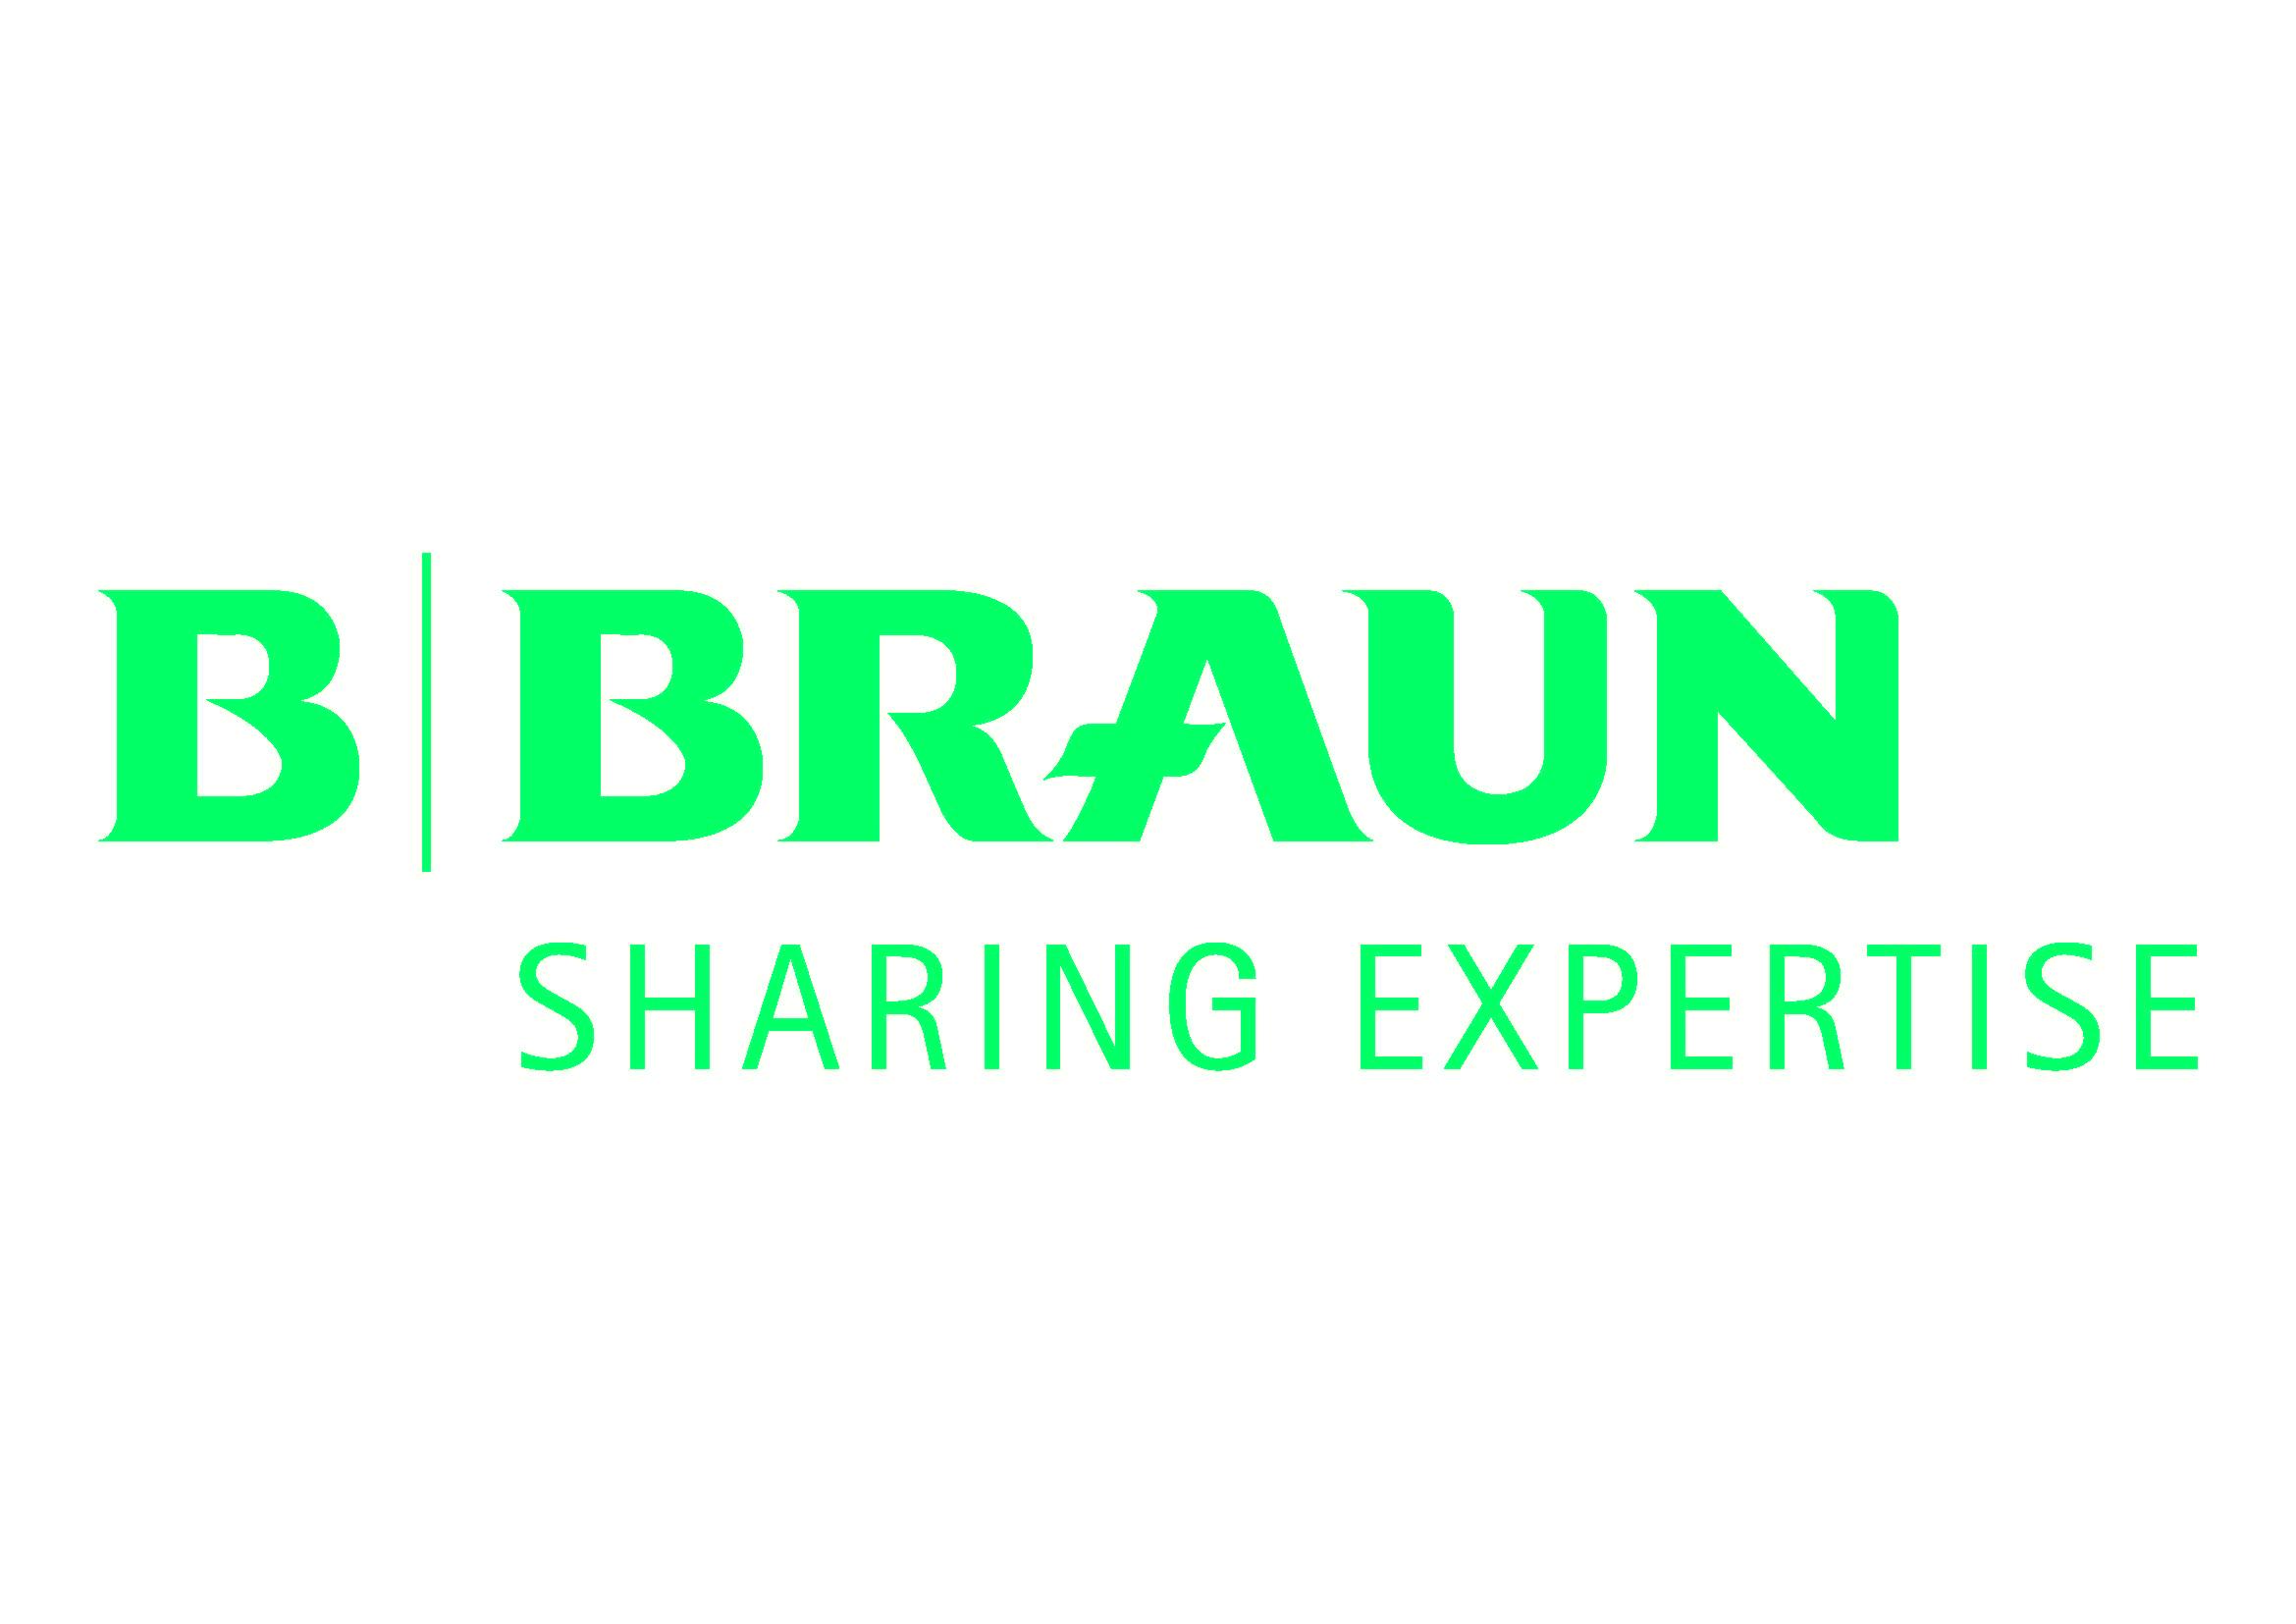 Logotipo de BBraun